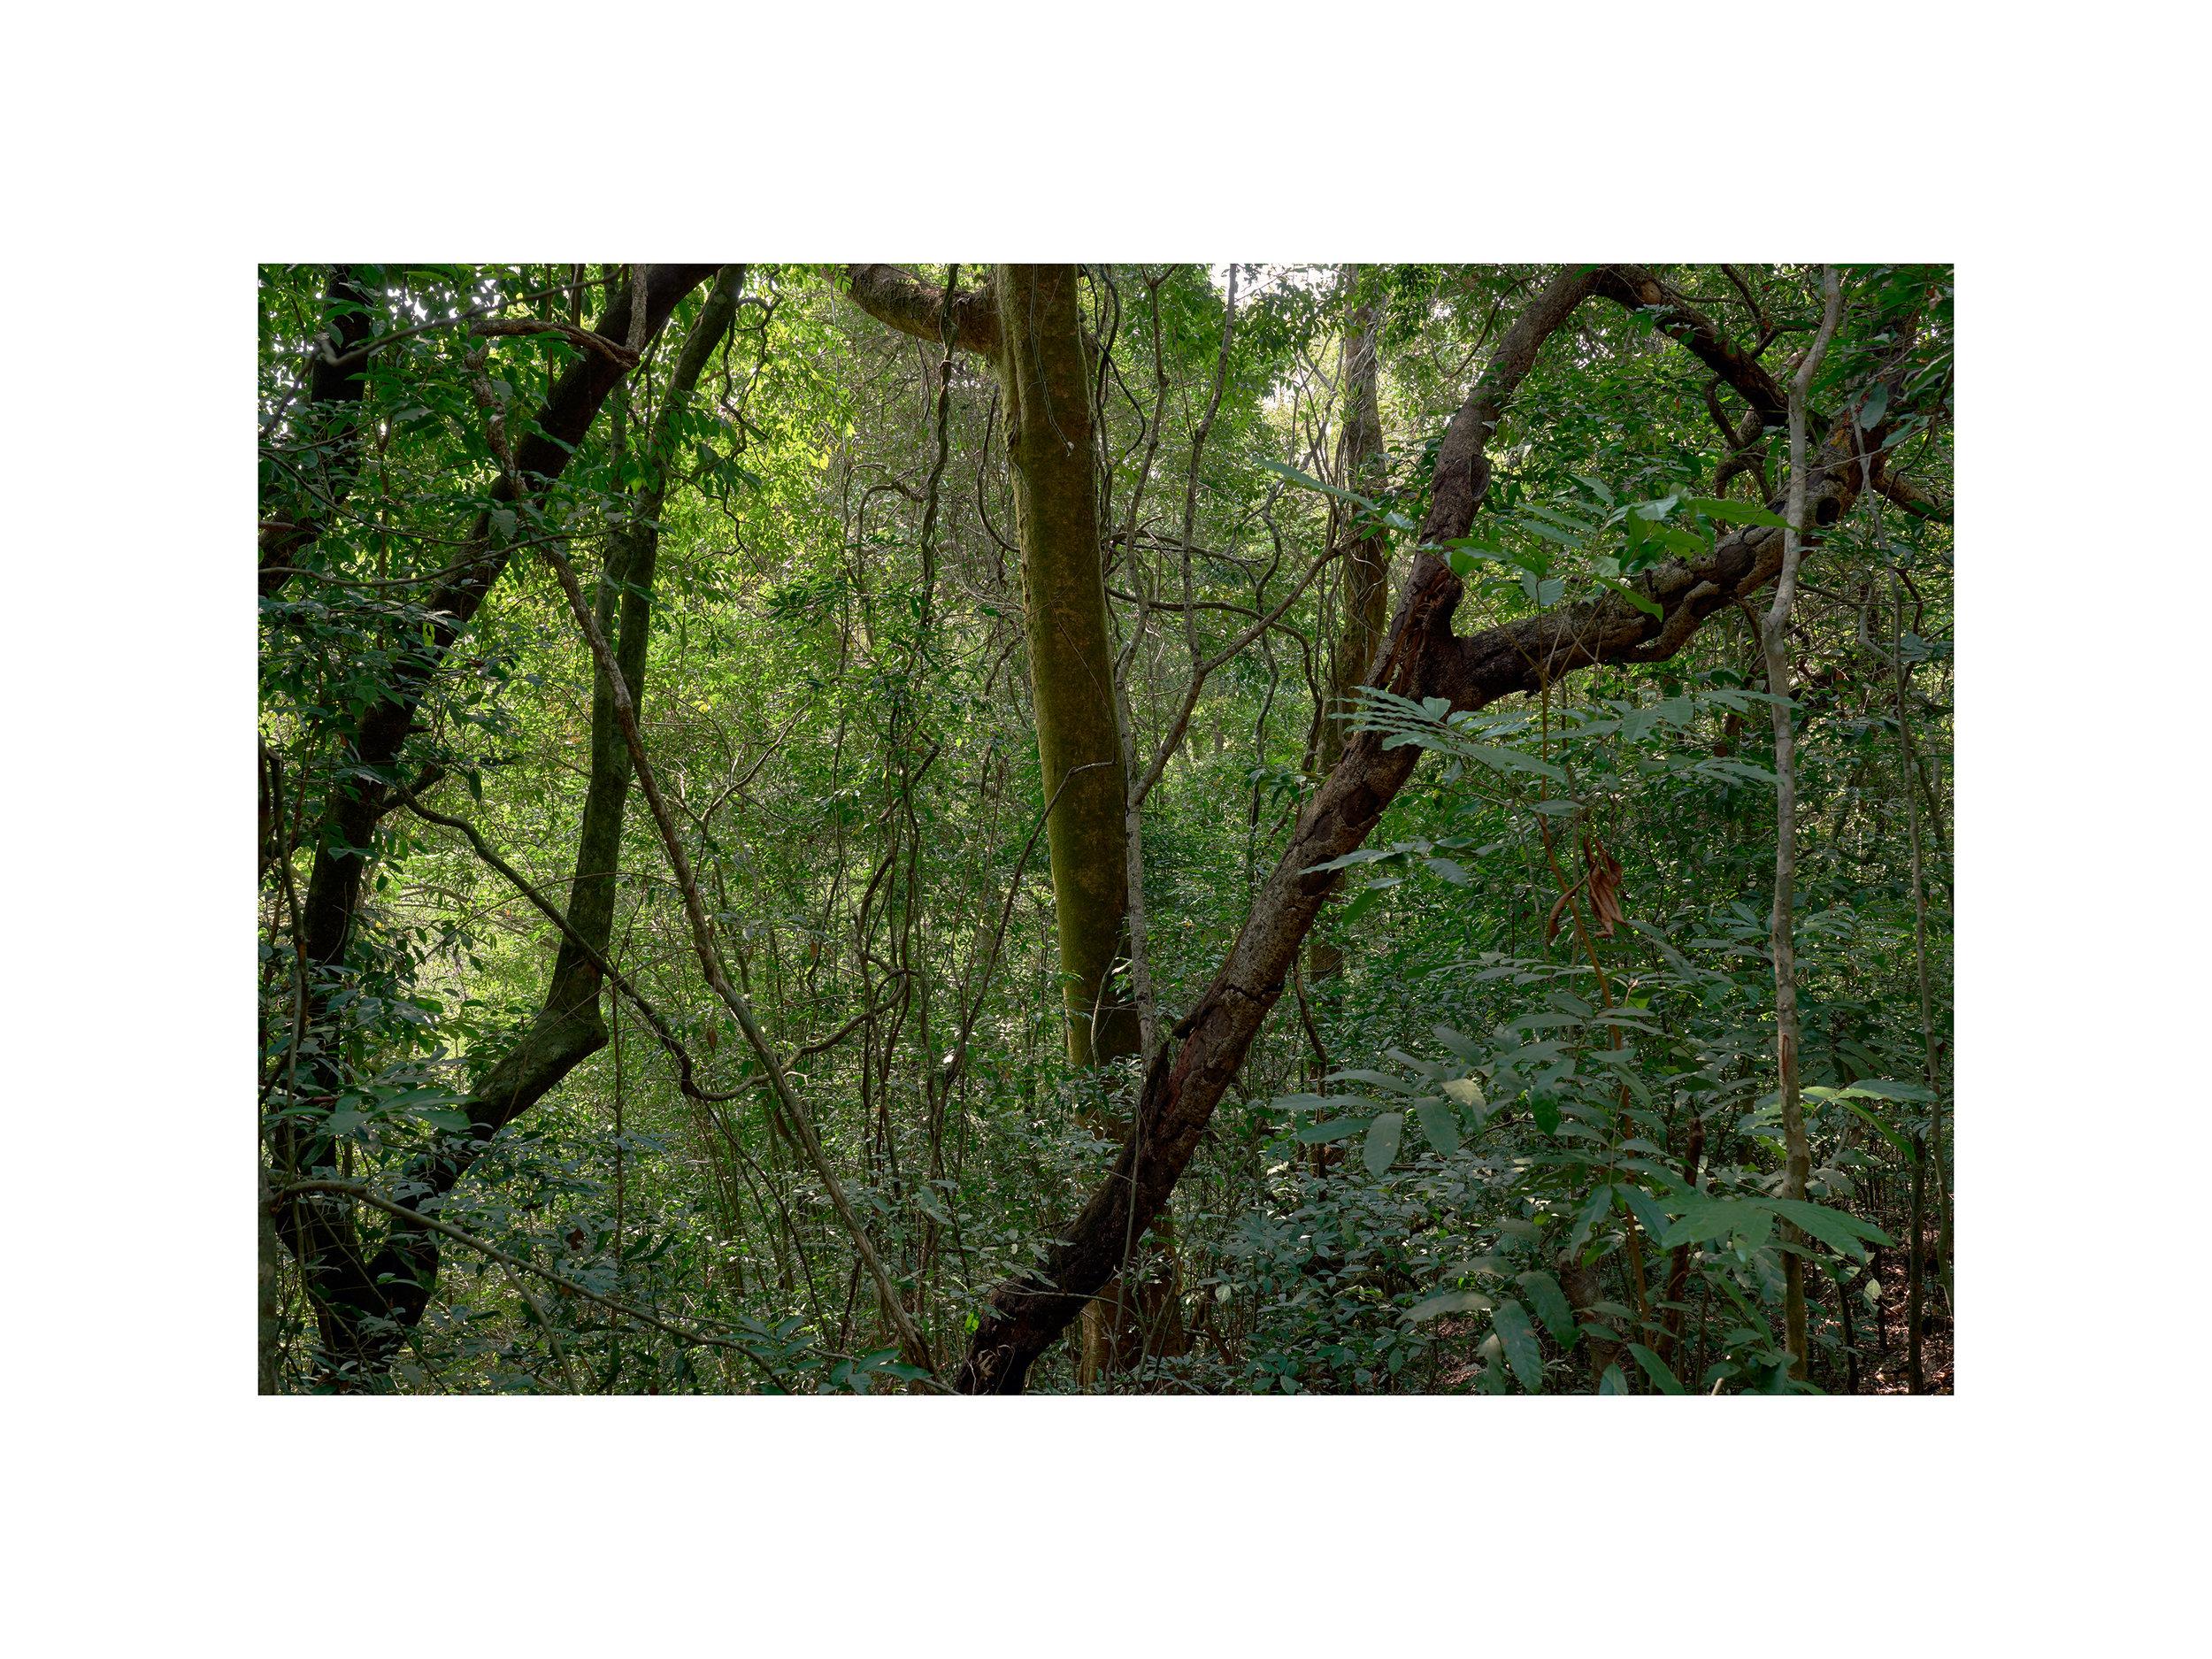 Rainforest no.1